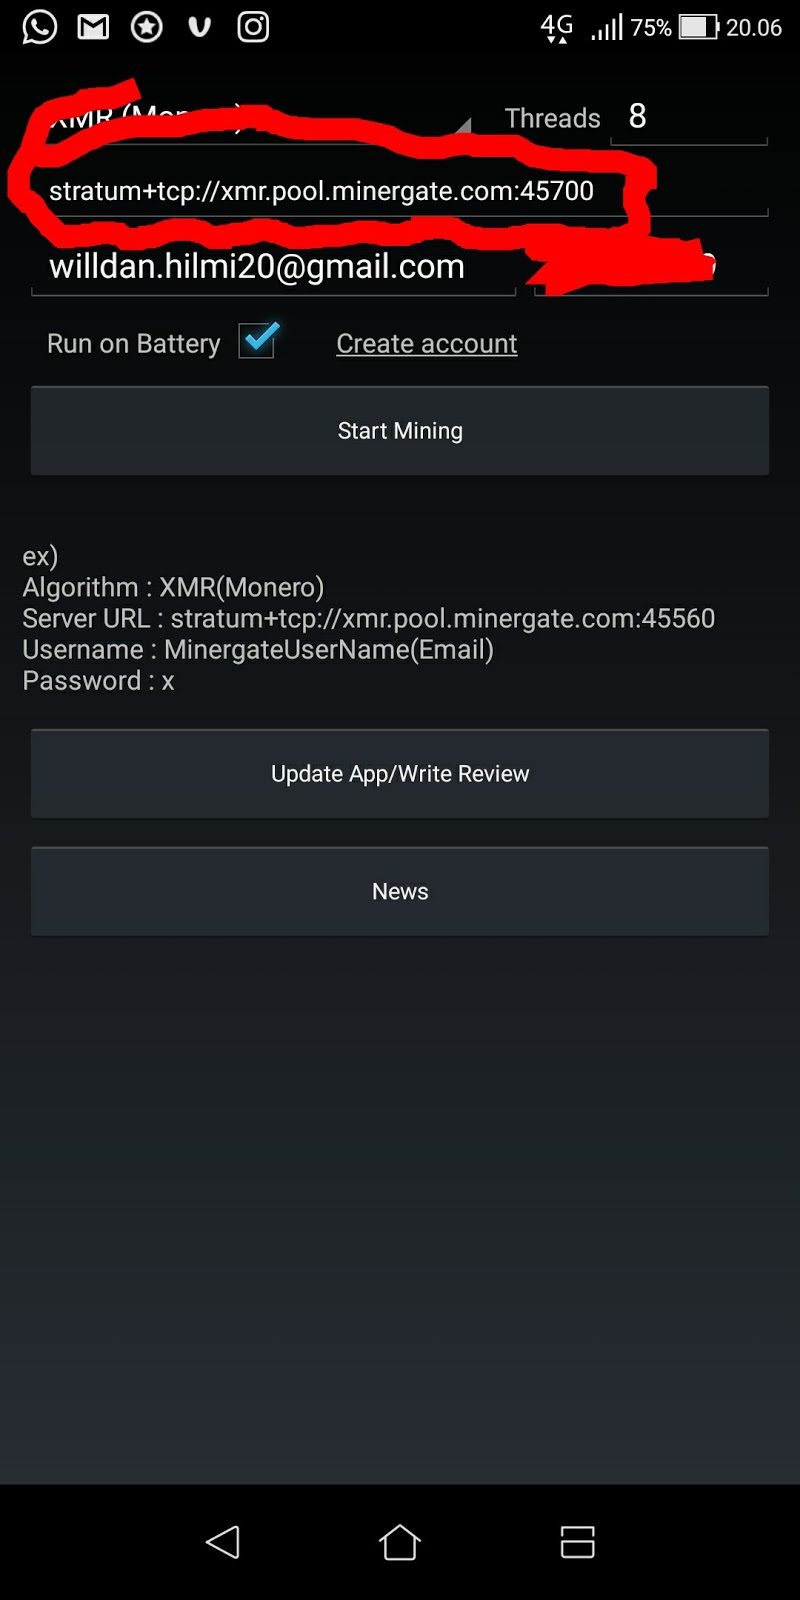 Cara mining dengan AA miner di android